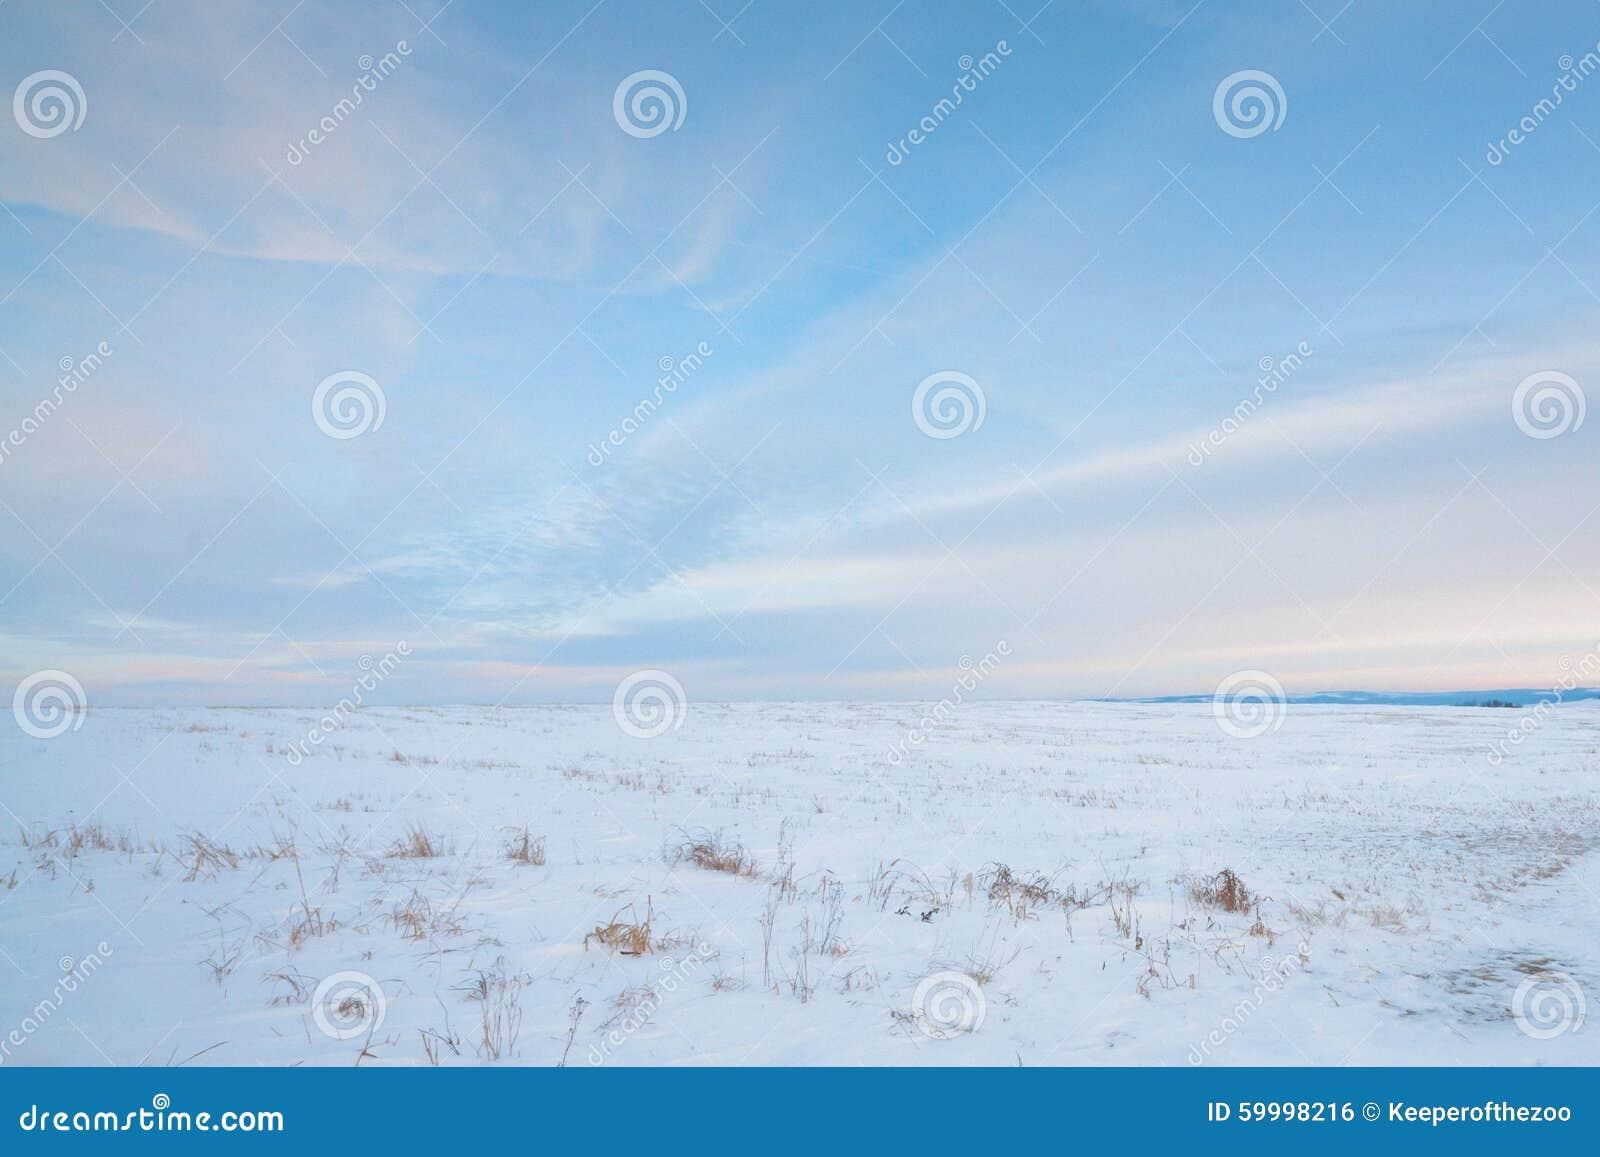 Download Snowy Prairie stock photo. Image of beautiful, meadow - 59998216